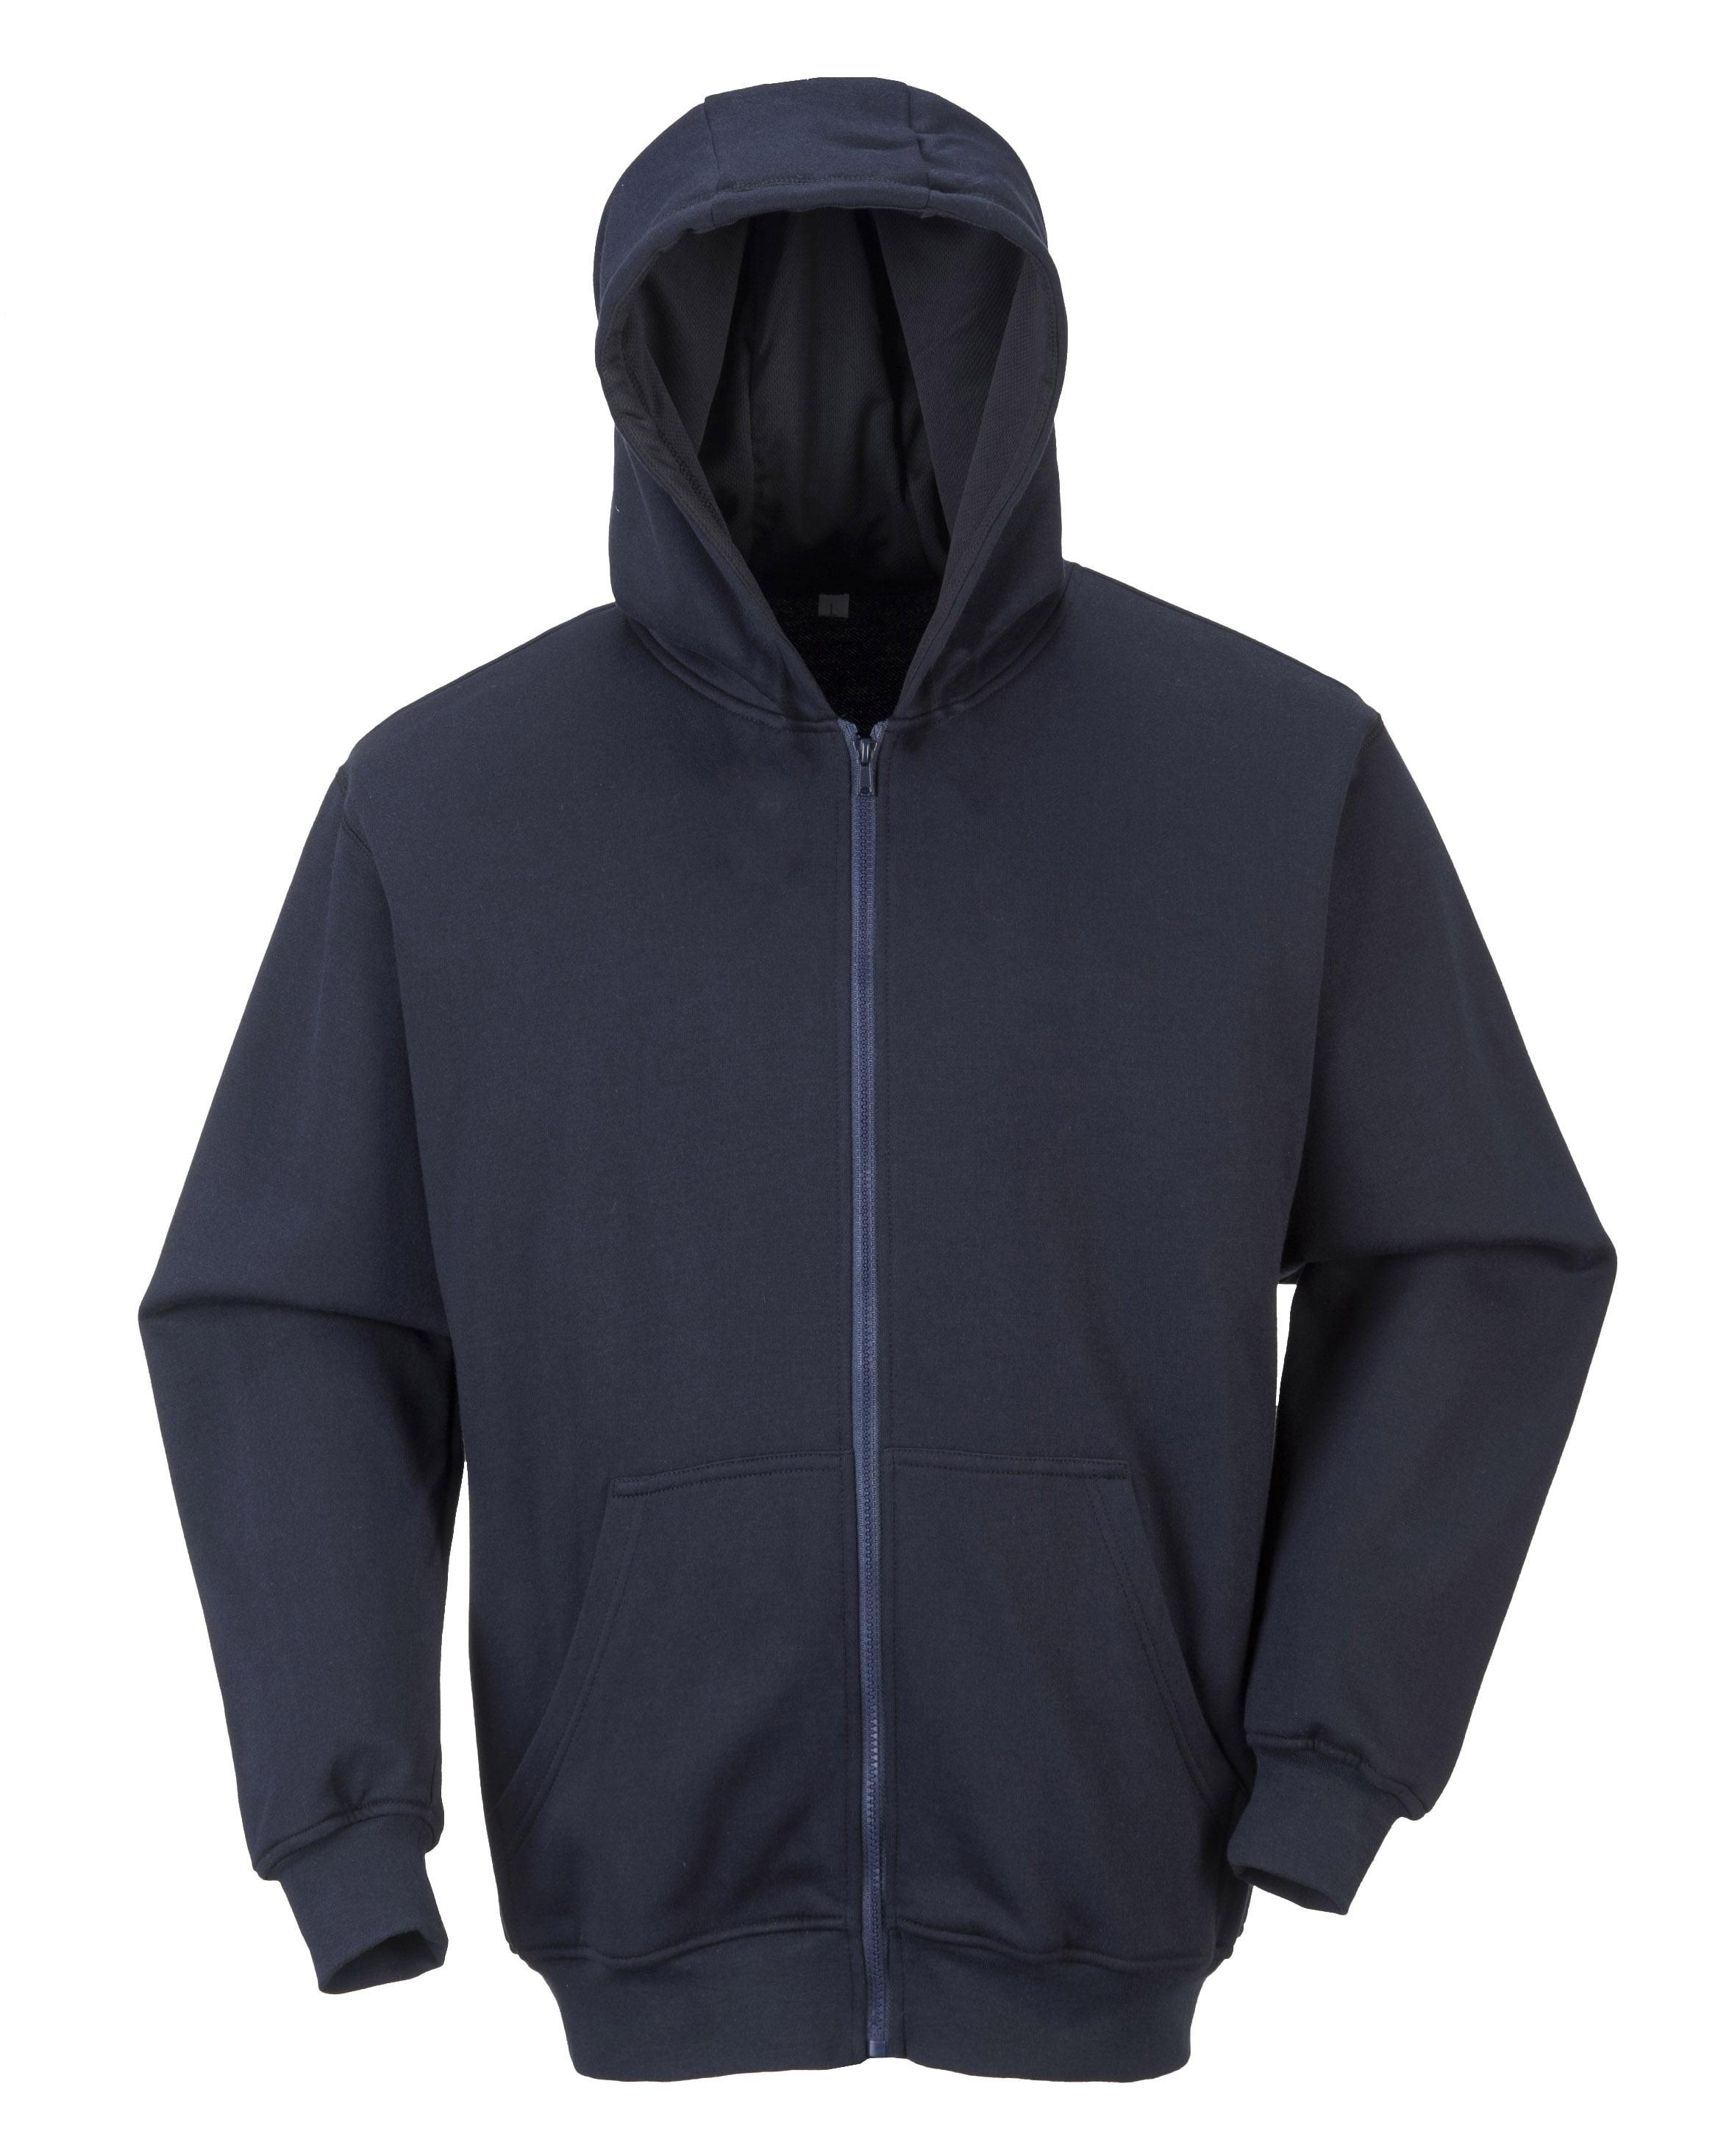 31a808444397 Portwest UFR81 Modaflame Fire Resistant Sweatshirt — iWantWorkwear